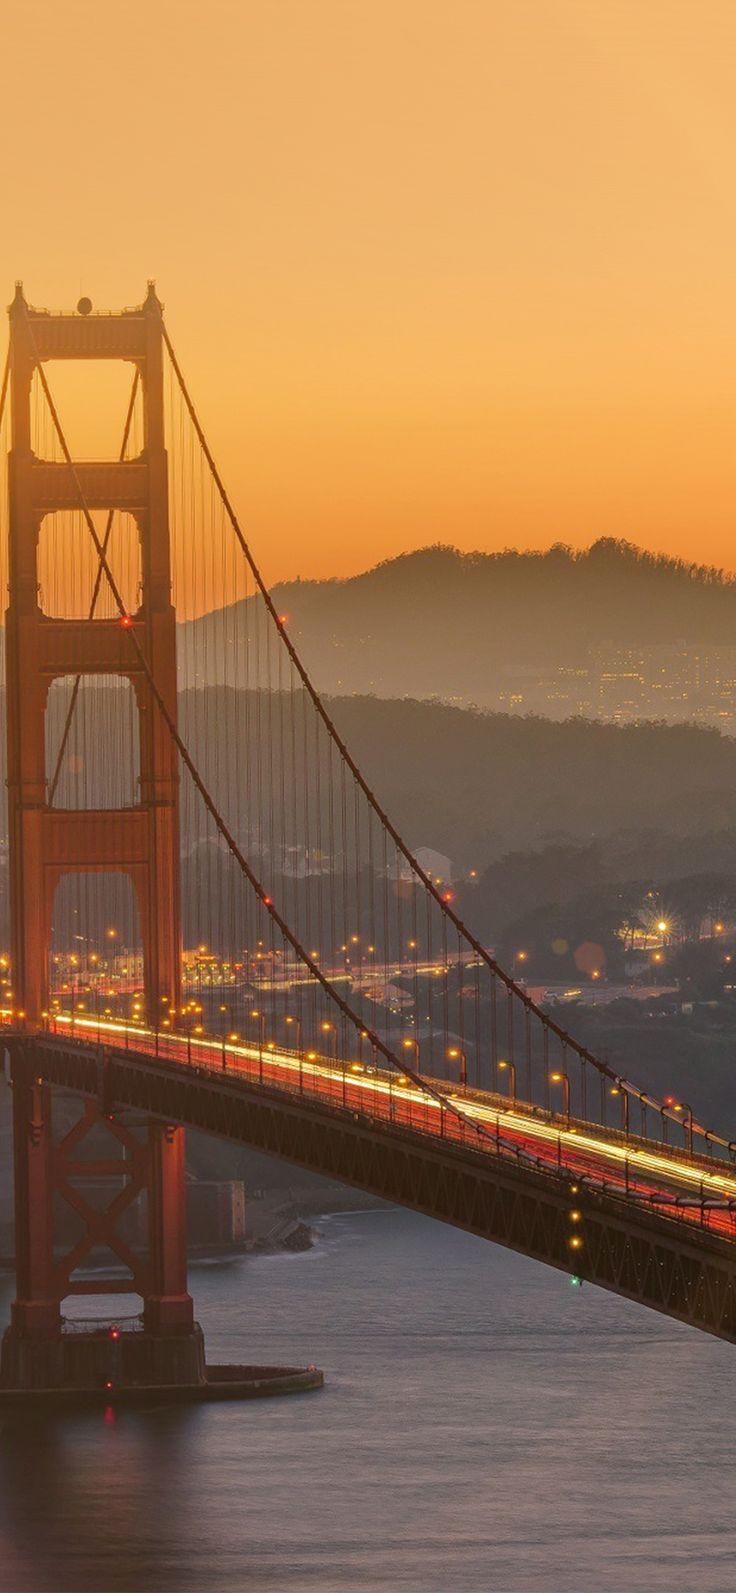 ne11-bridge-orange-sunset-river-city-lights-flare via iPhoneXpapers.com - Wallpa... ne11-bridge-orange-sunset-river-city-lights-flare via <a href=